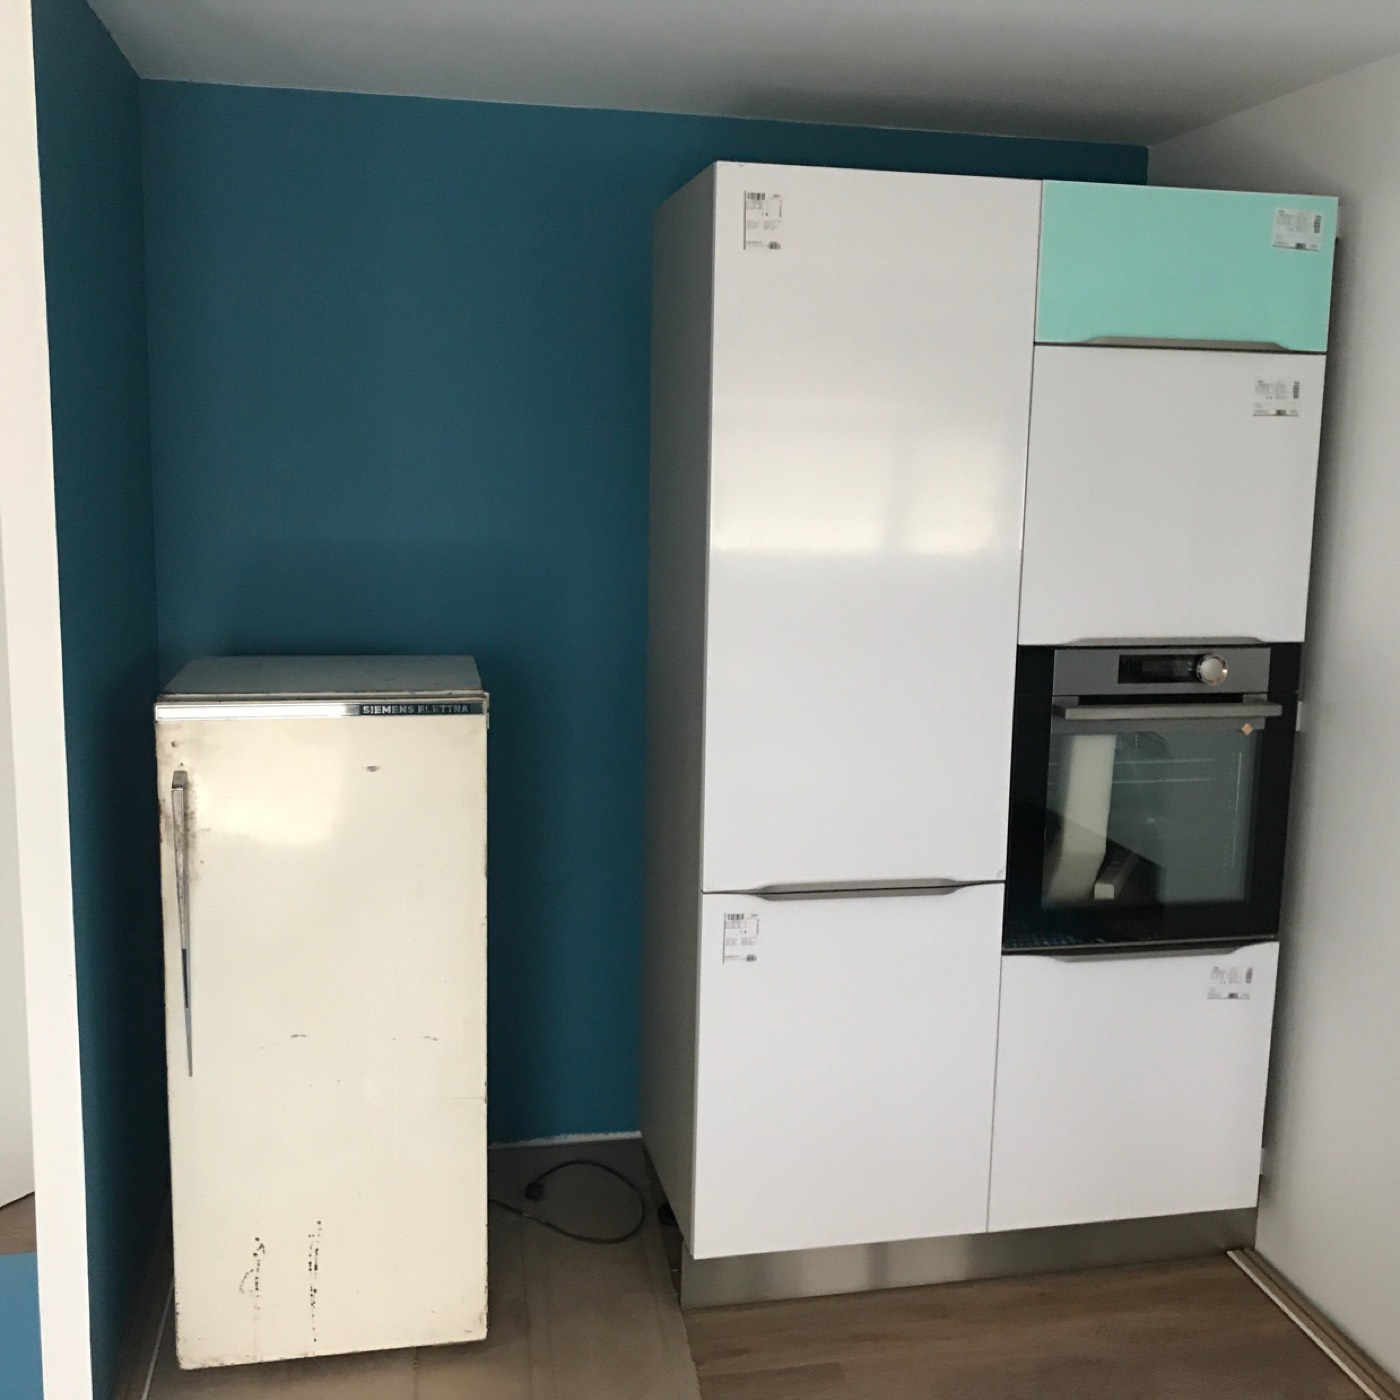 07/09/2017 Epidose 62! Emménagement